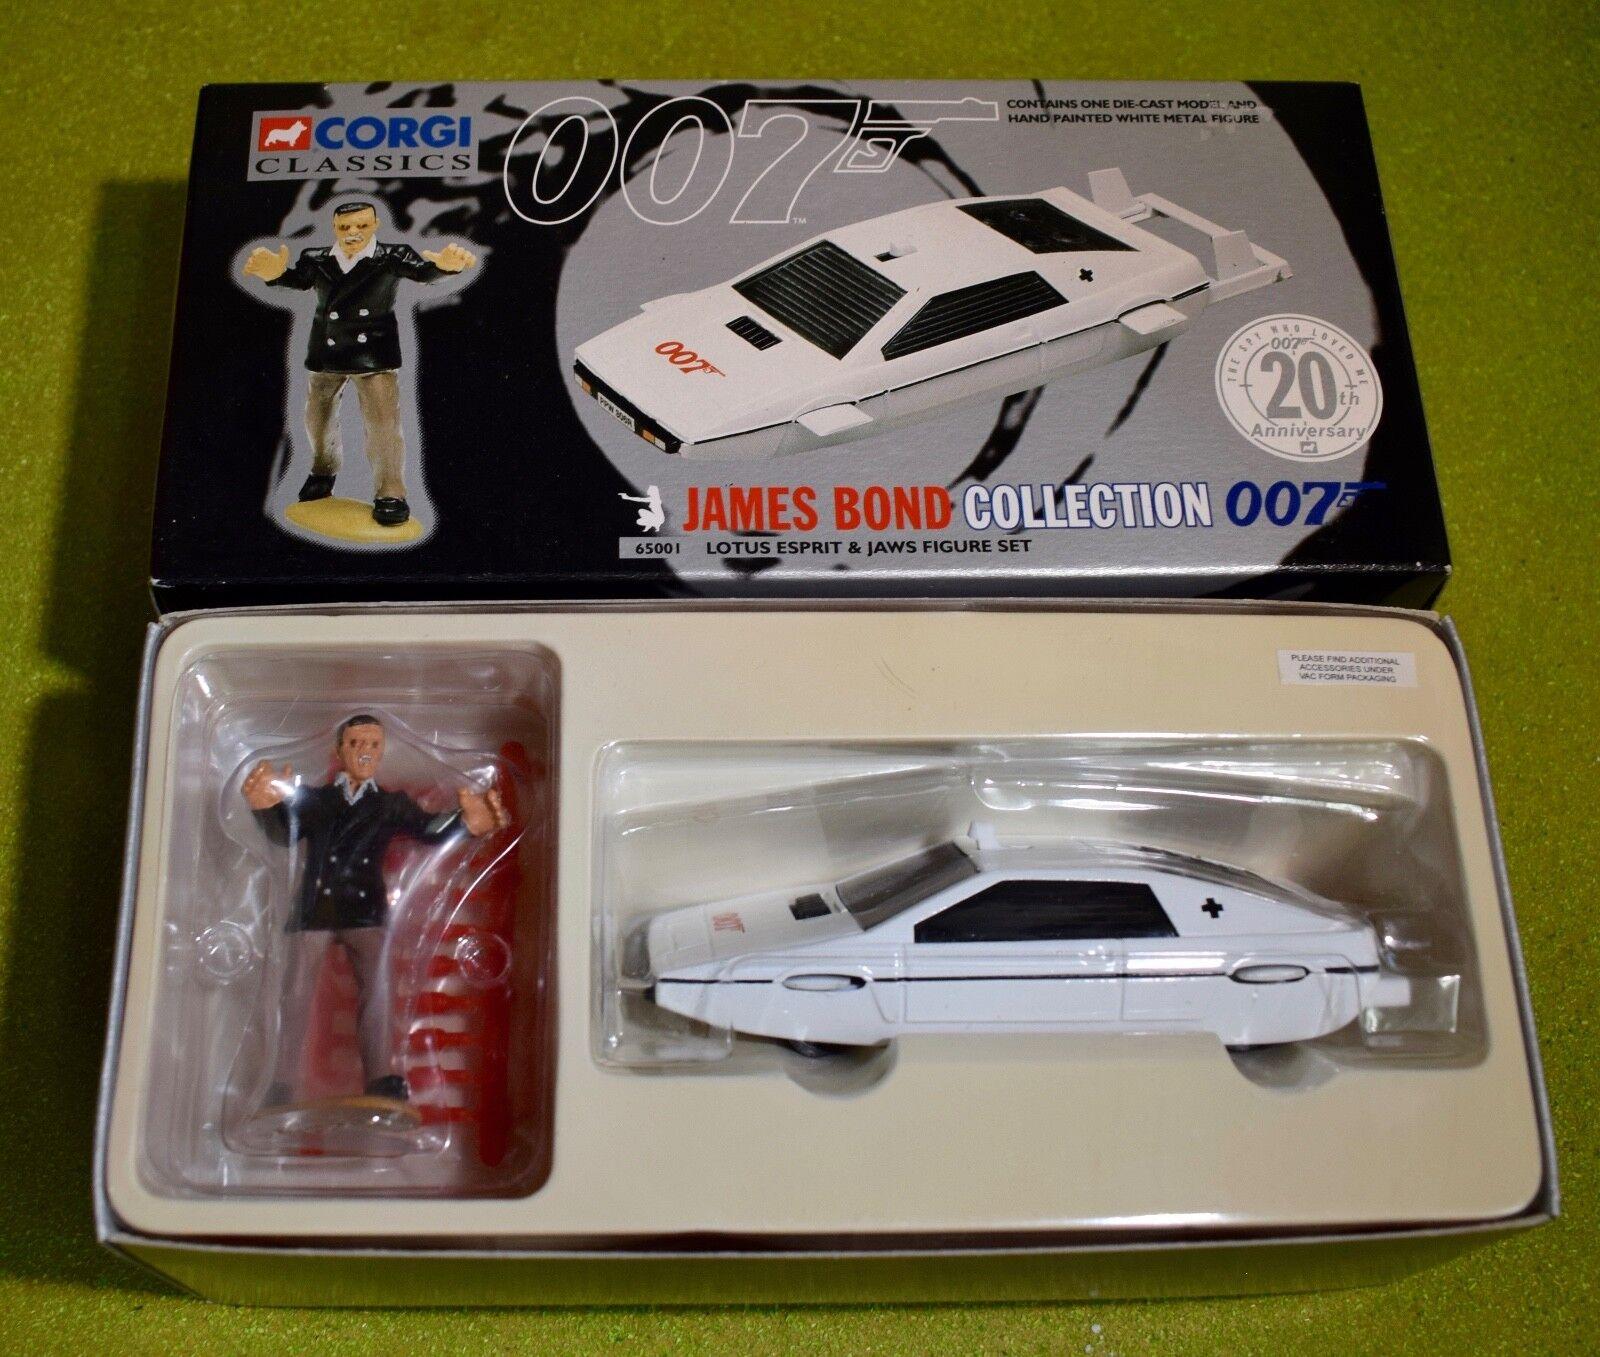 CORGI JAMES BOND 007 LOTUS ESPRIT & JAWS FIGURE SET 65001